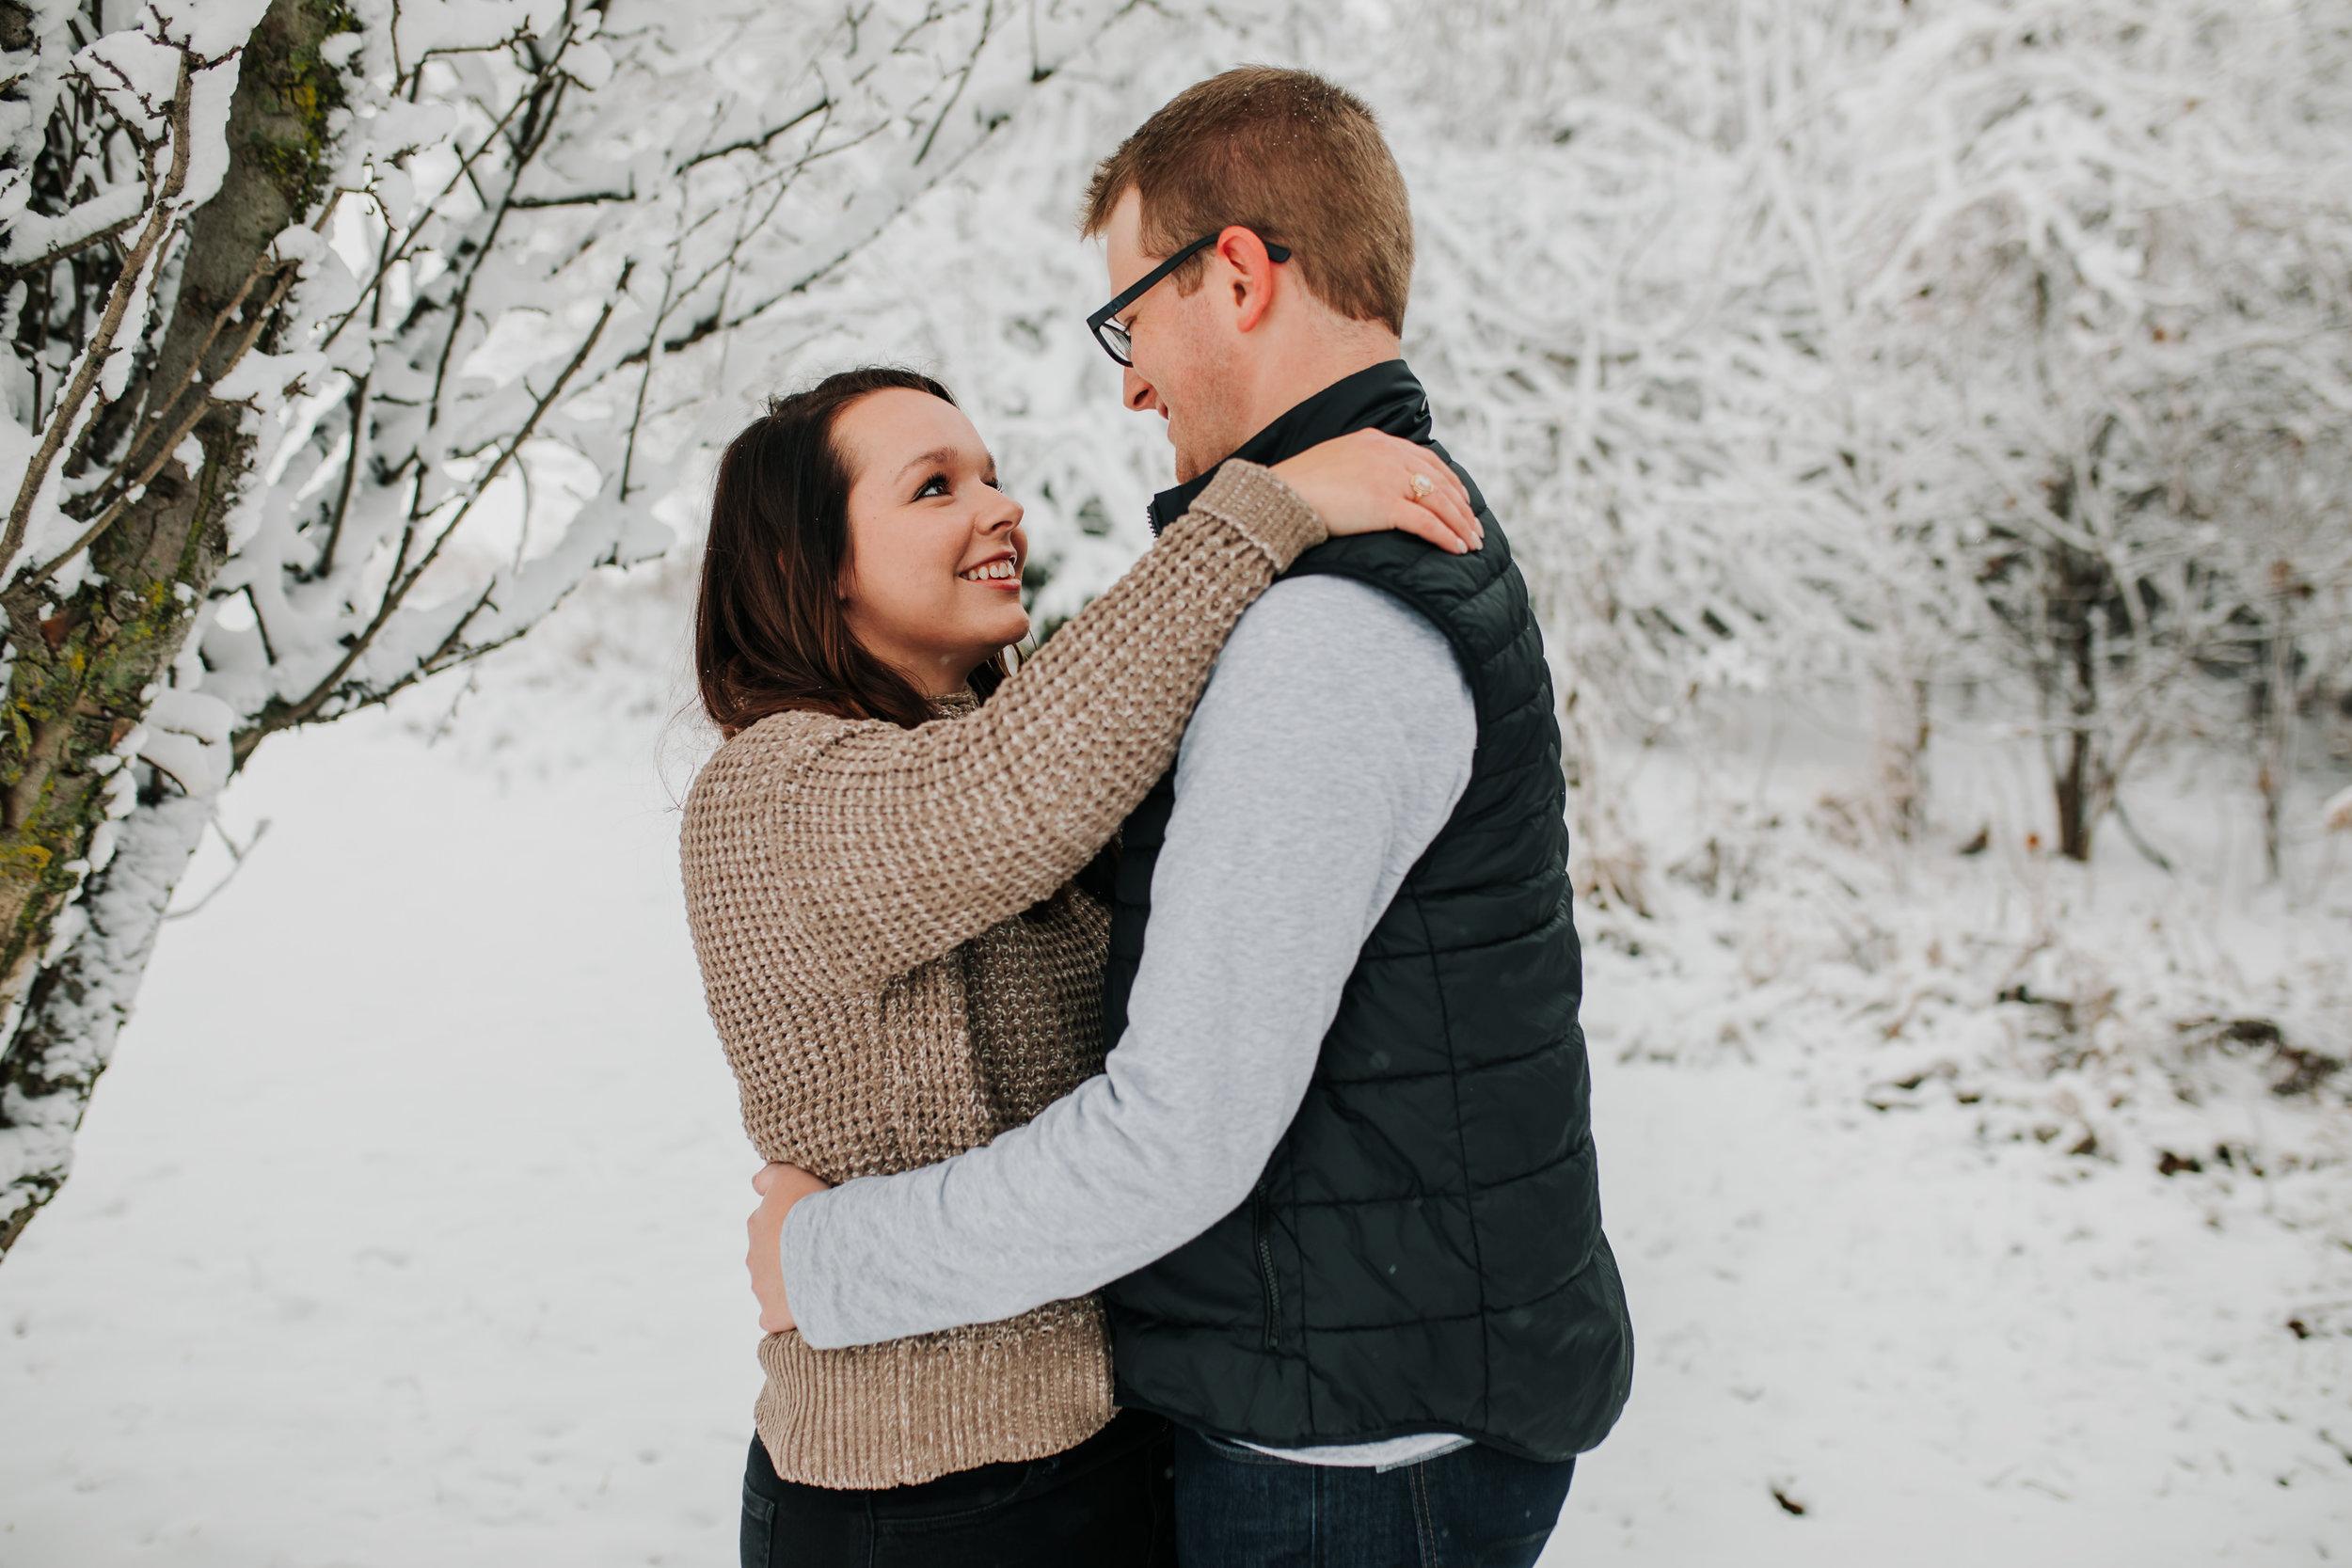 Vanessa & Dan - Engaged - Nathaniel Jensen Photography - Omaha Nebraska Wedding Photographer - Standing Bear Lake - Snowy Engagement Session-24.jpg